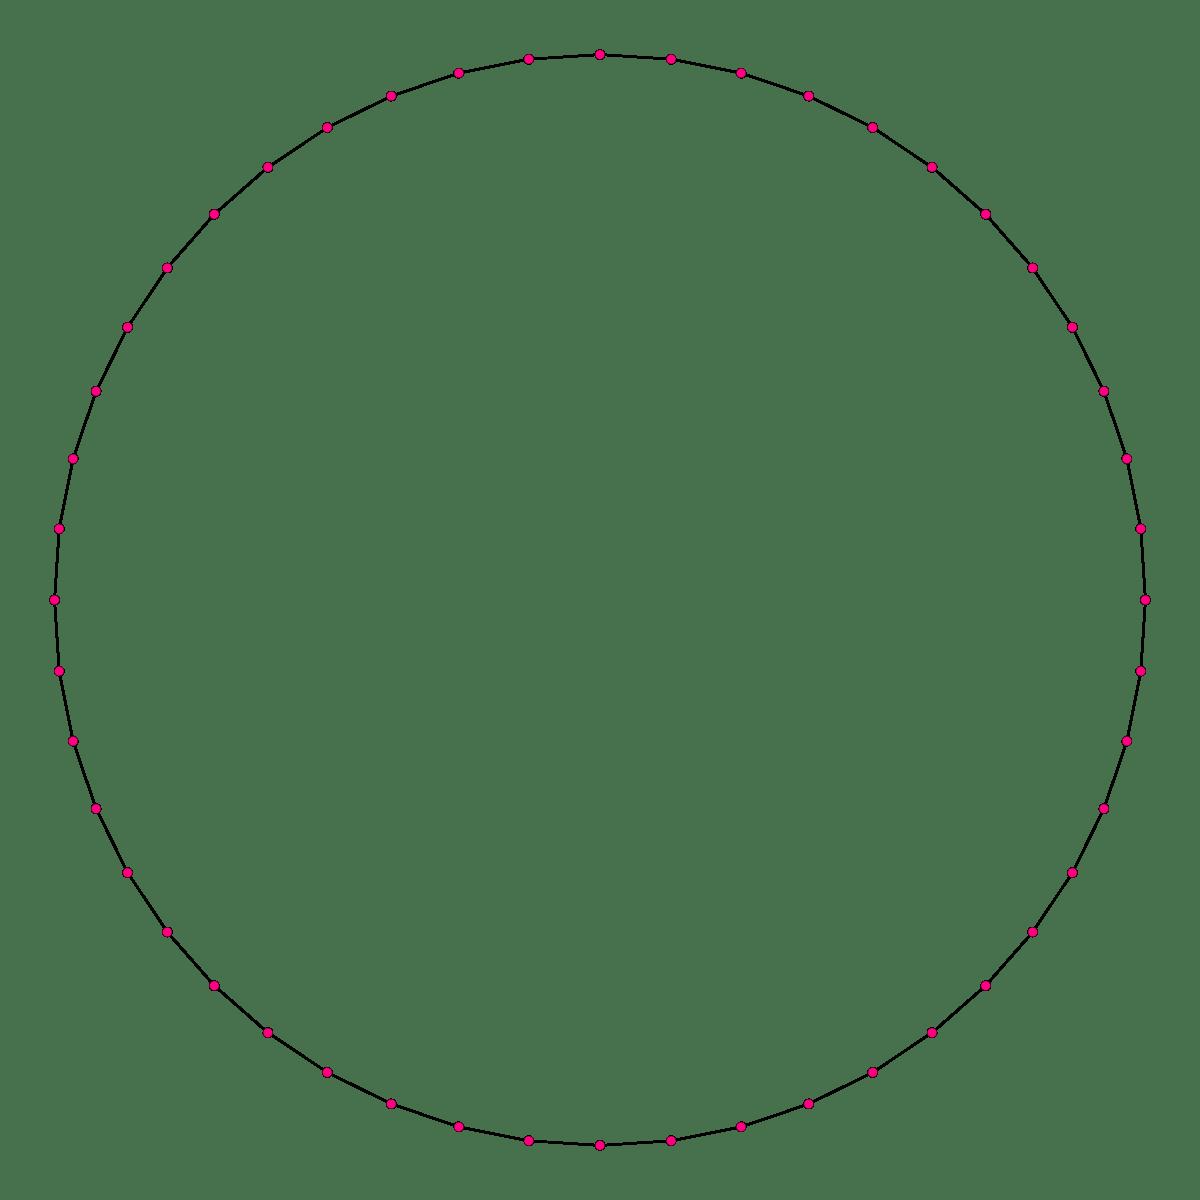 Clipart Shapes Polygon Clipart Shapes Polygon Transparent